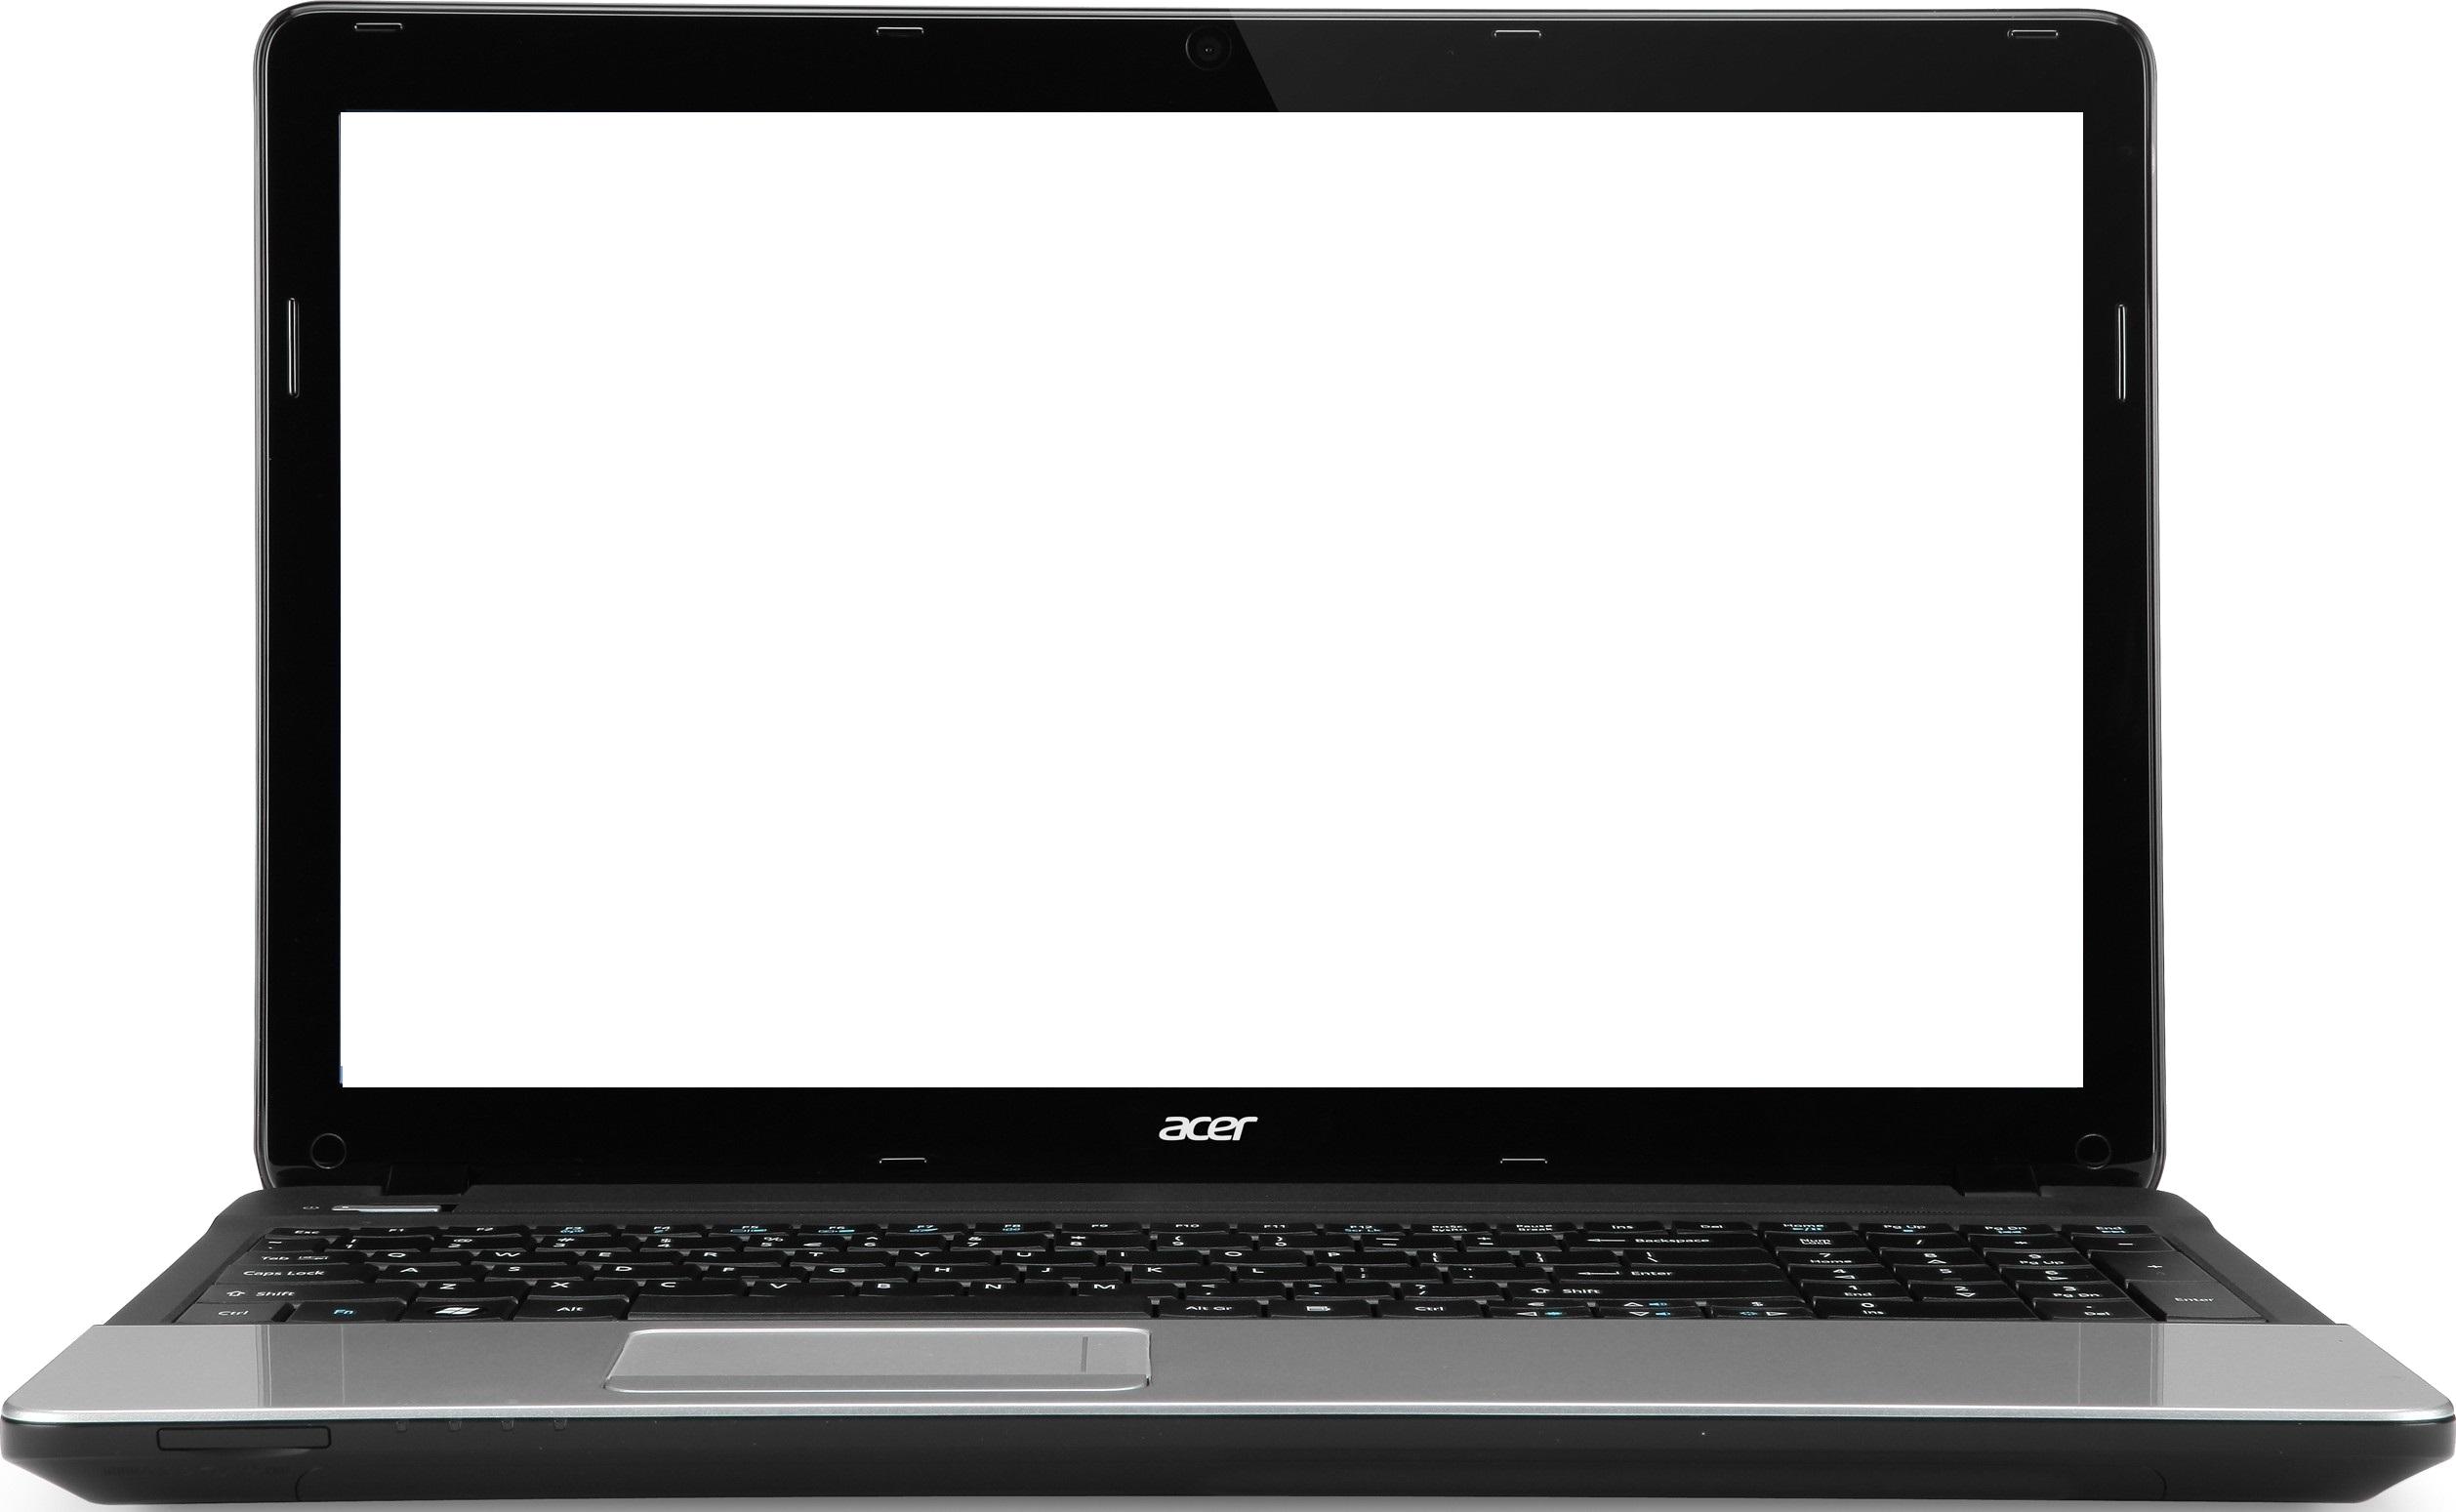 Laptop, Notebook, Blank, Screens Png image #39911